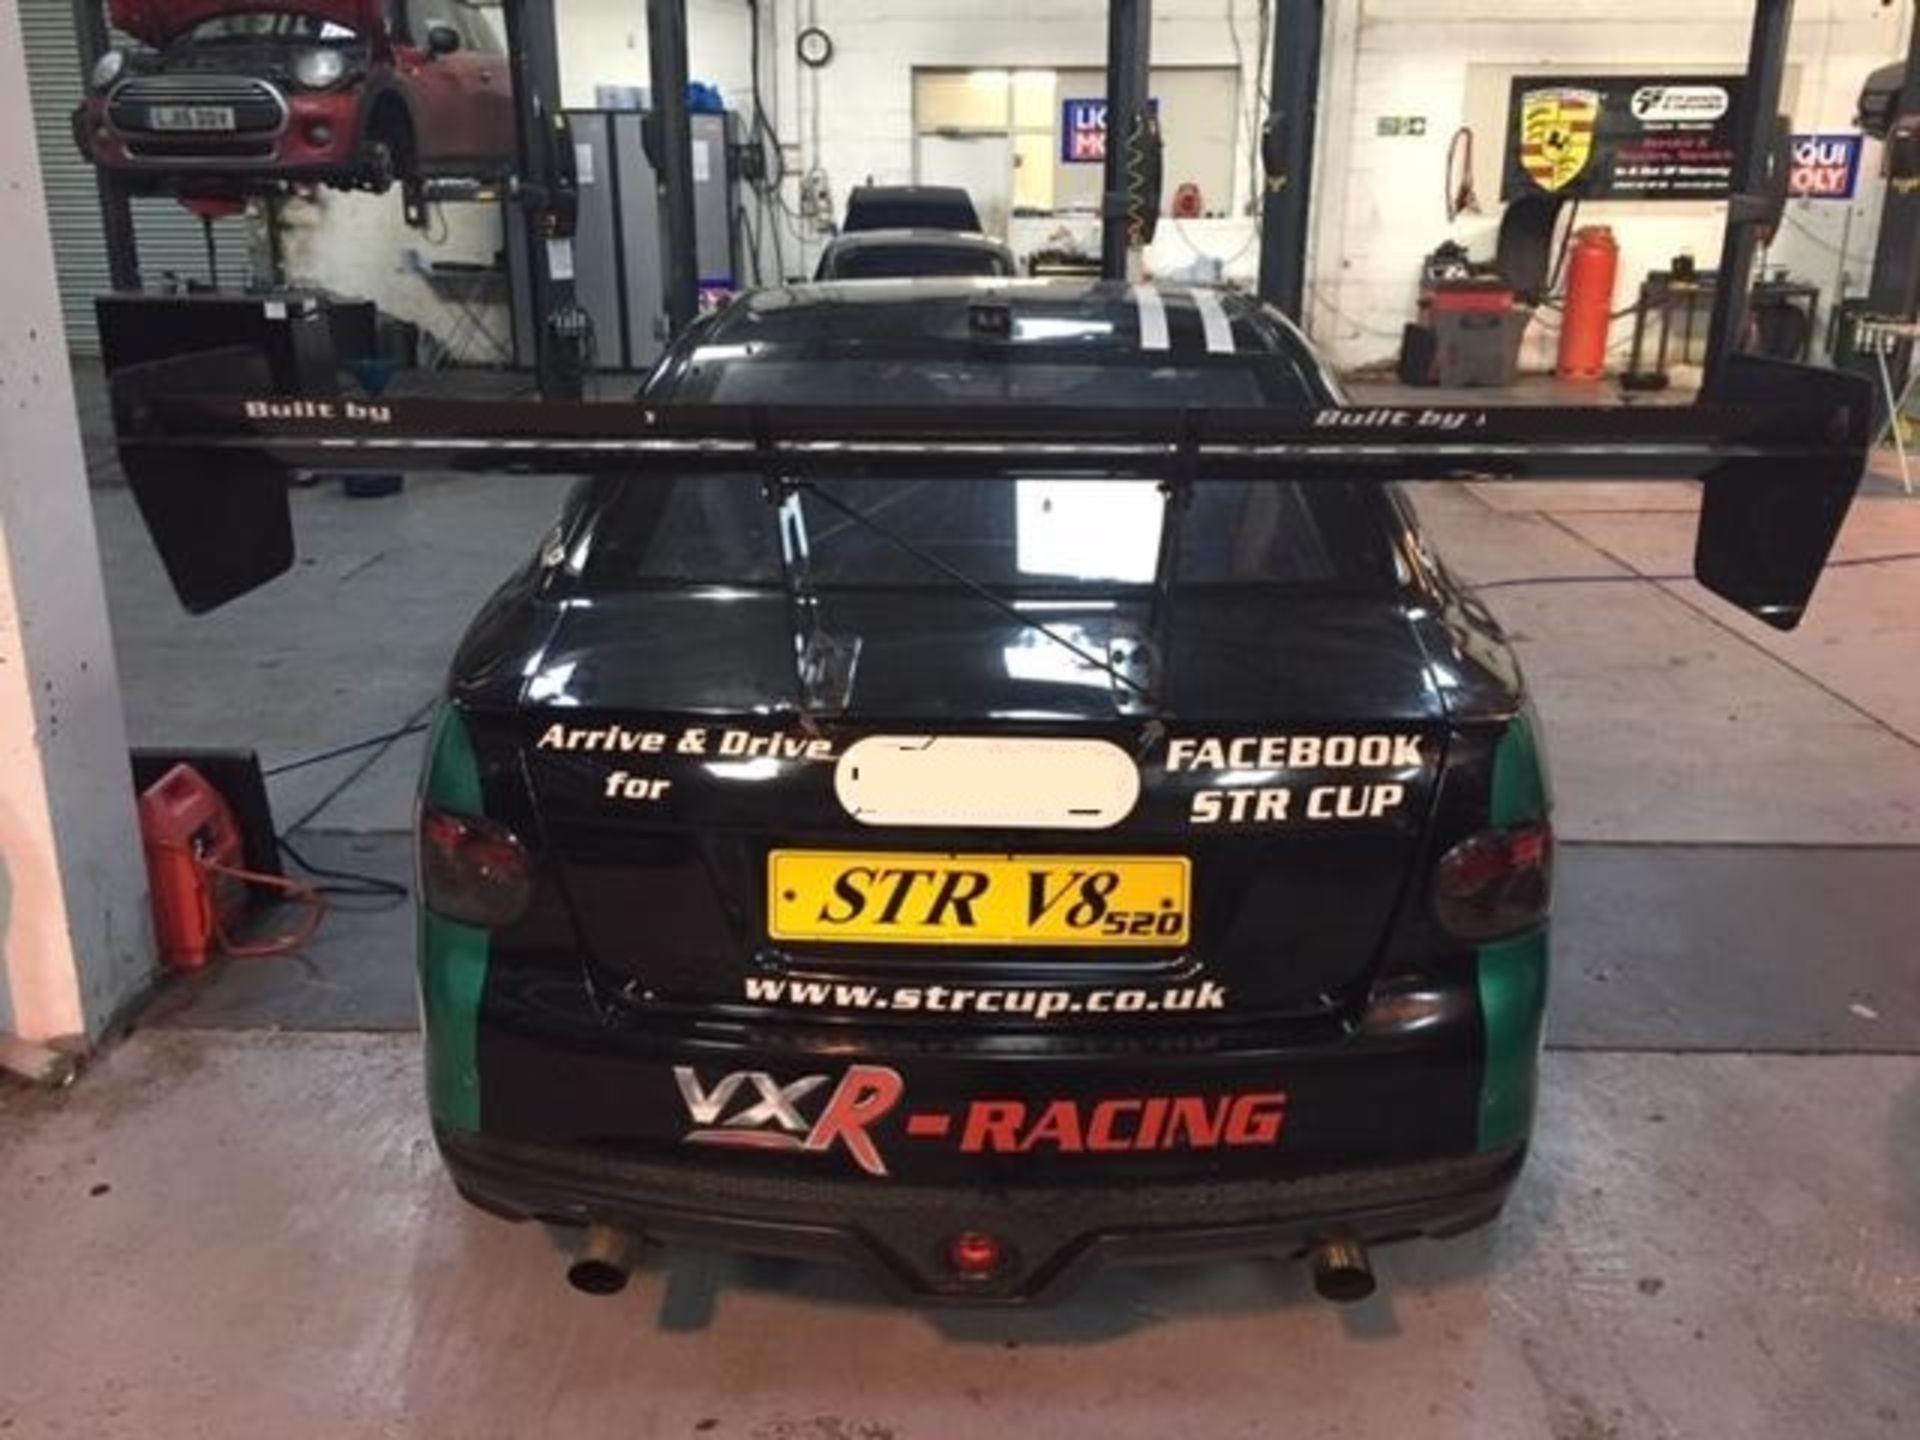 Lot 35 - VXR8 HOLDEN COMMODORE ls3 V8 6.2 FULL RACE CAR OVER 500 BHP